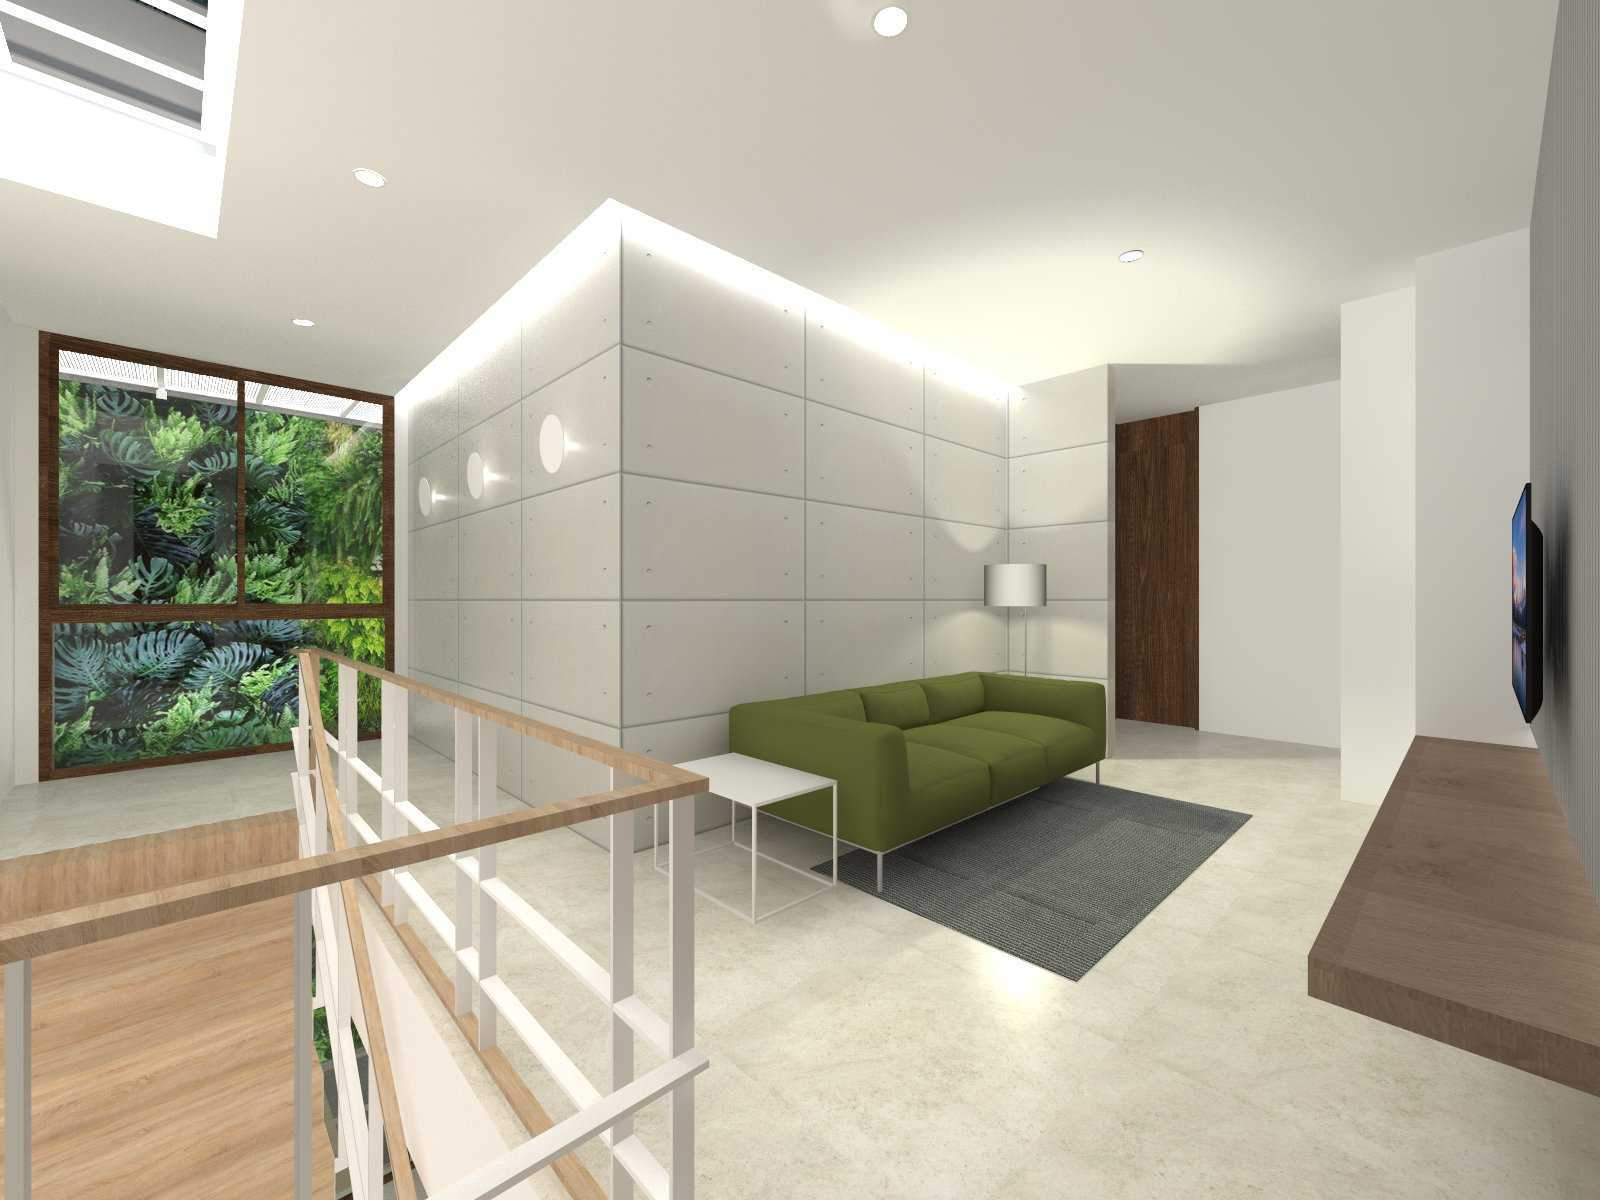 Giat Kedoya Private House Jakarta, Daerah Khusus Ibukota Jakarta, Indonesia Jakarta, Daerah Khusus Ibukota Jakarta, Indonesia Giat-Kedoya-Private-House  63772